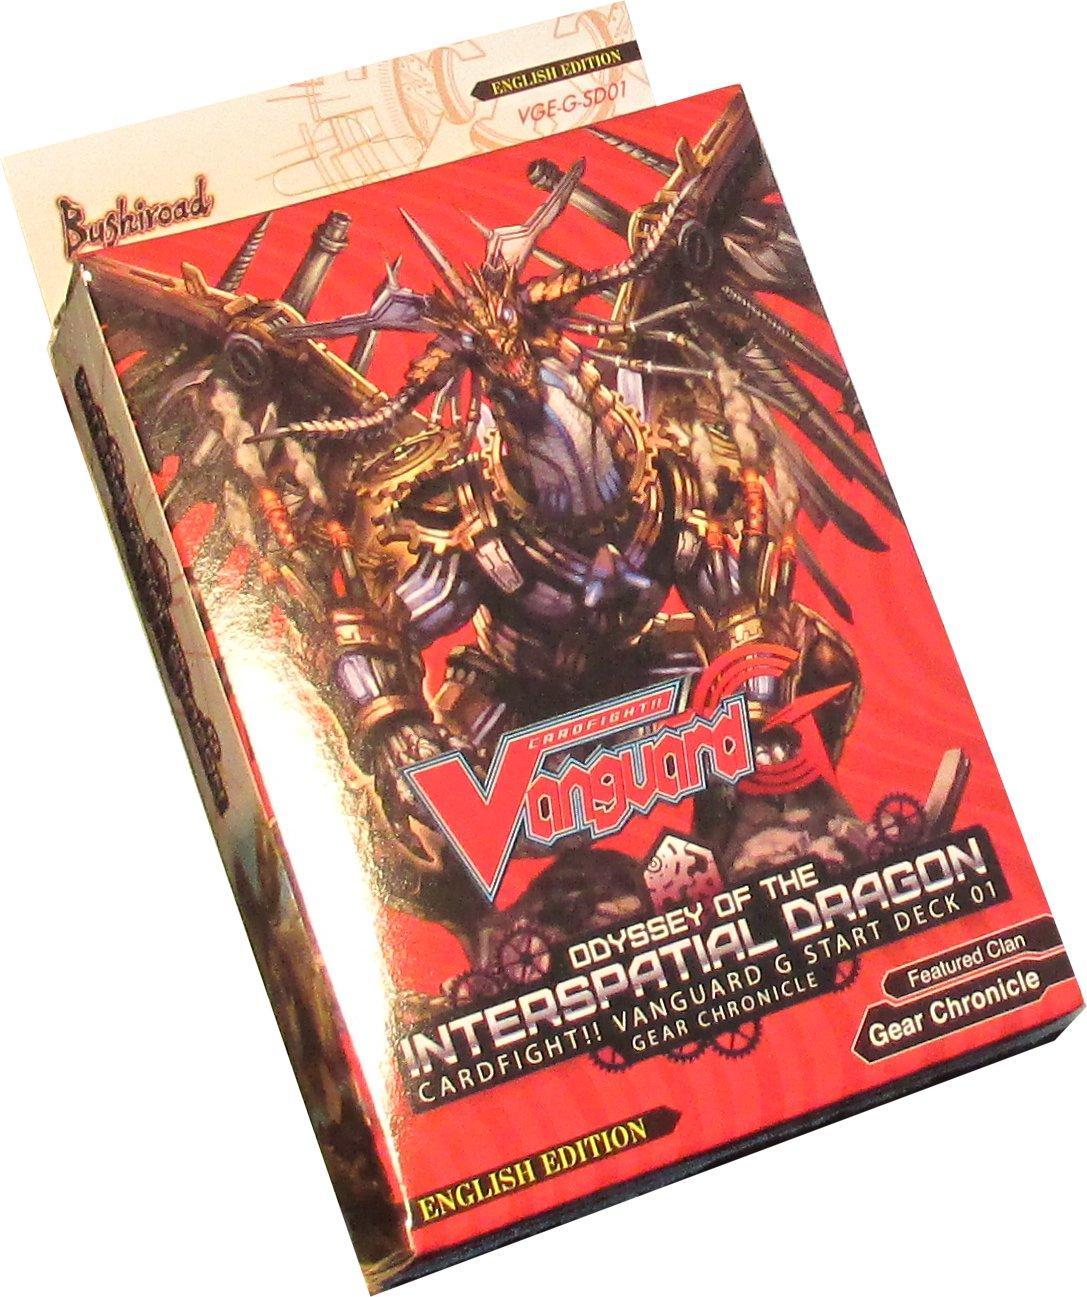 vanguard g deck  Cardfight Vanguard: Interspacial Dragon Start Deck $9 | Potomac ...